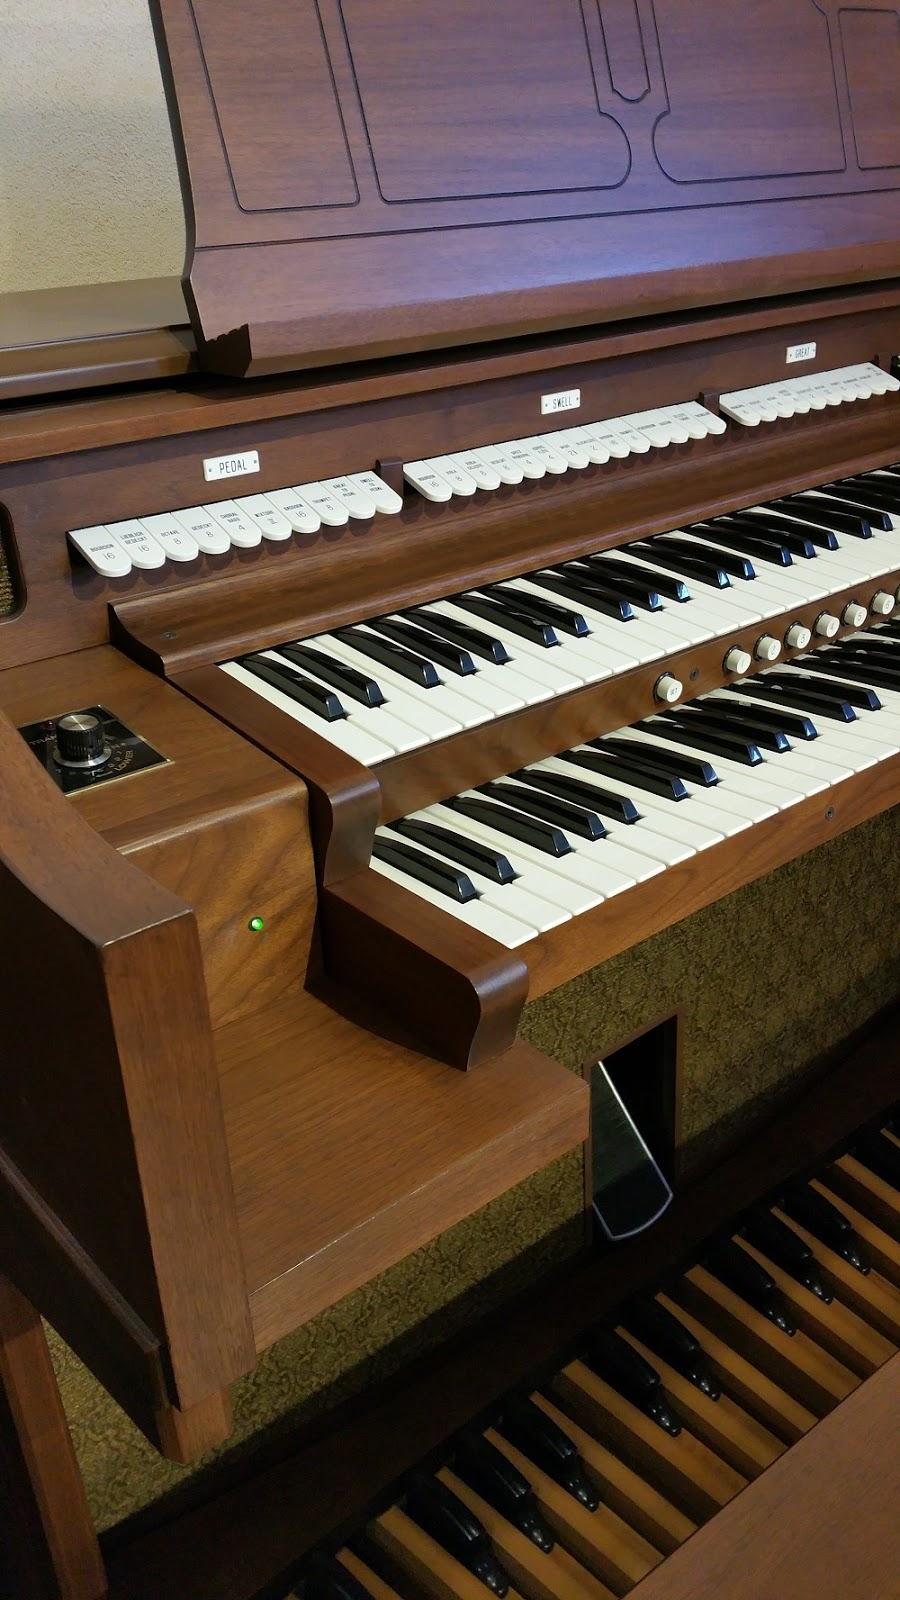 Used Allen ADC-220 organ - left stops